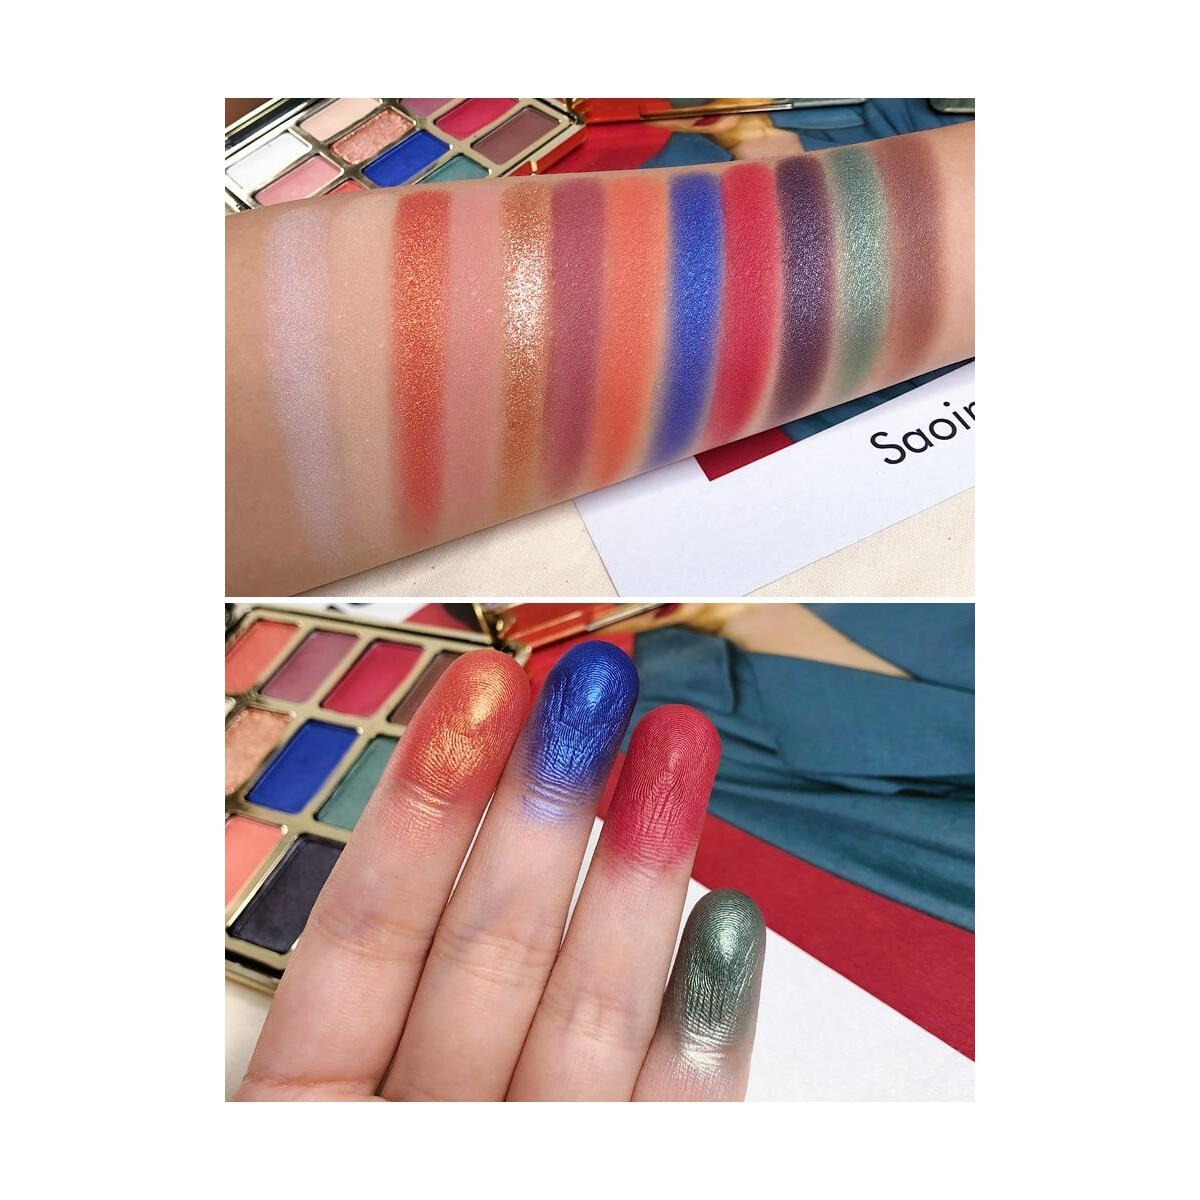 RomanticBird Febble Eyeshadow Diamond Glitter Metallic 12 Color Eyeshadow Palette, 03 / United States